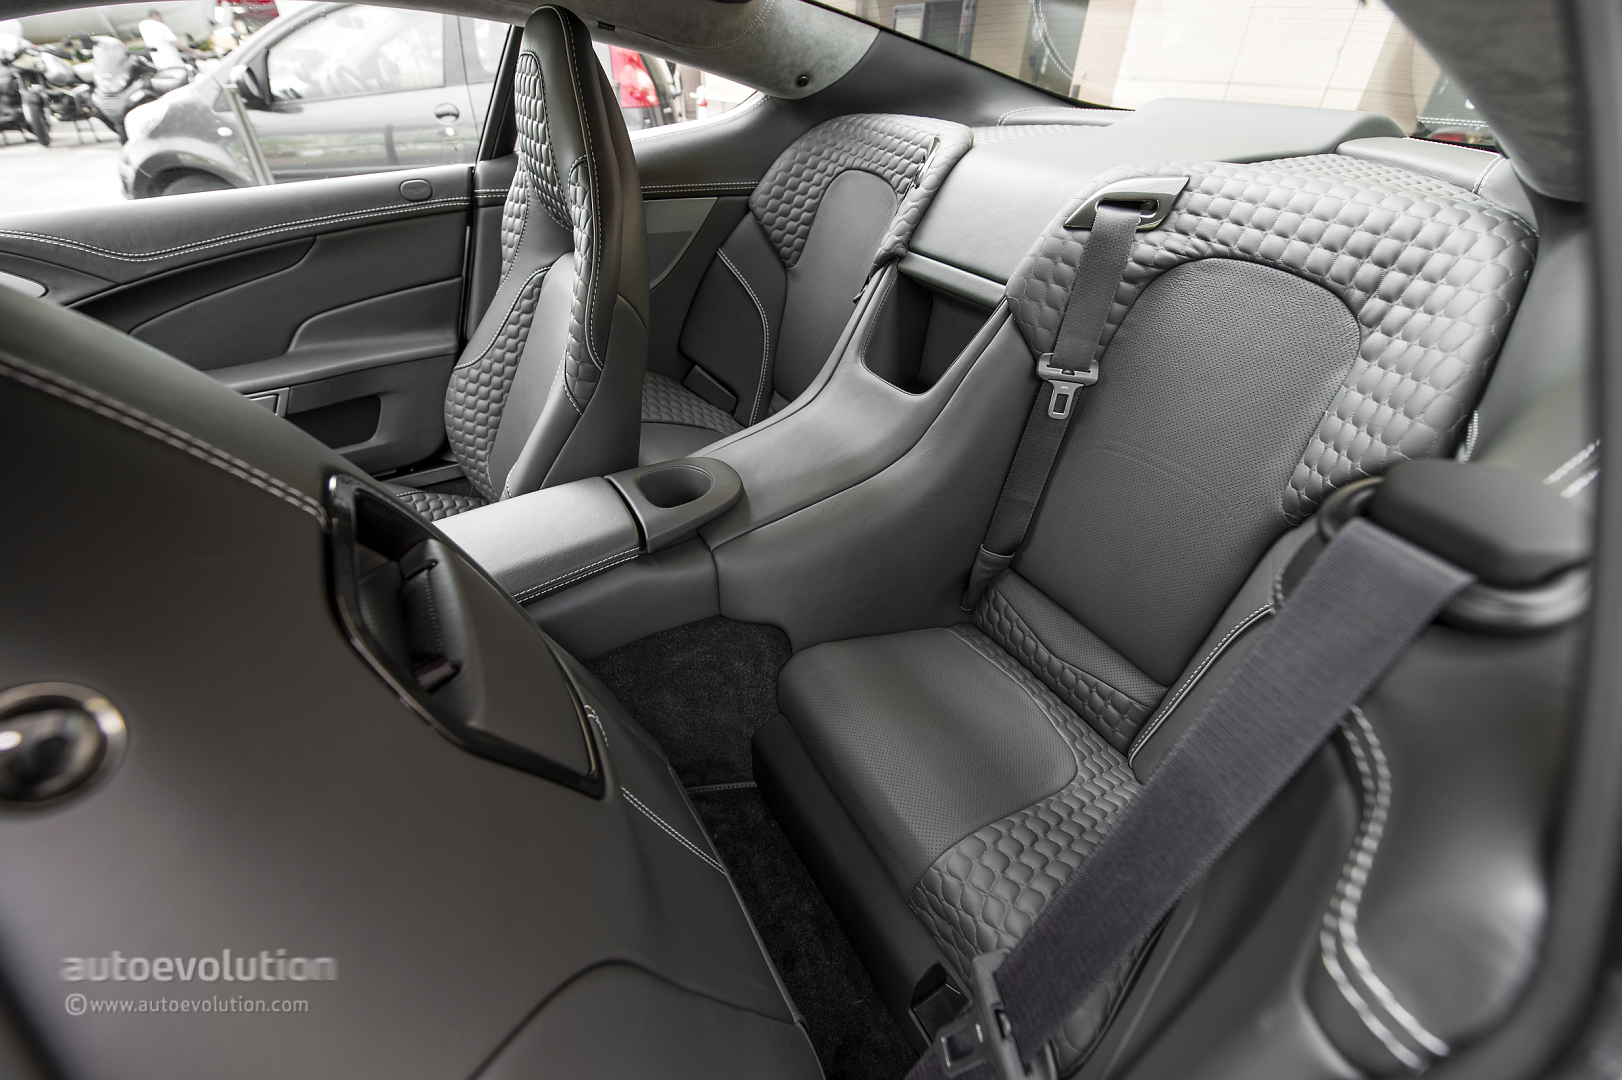 2014 ASTON MARTIN Vanquish Review - autoevolution